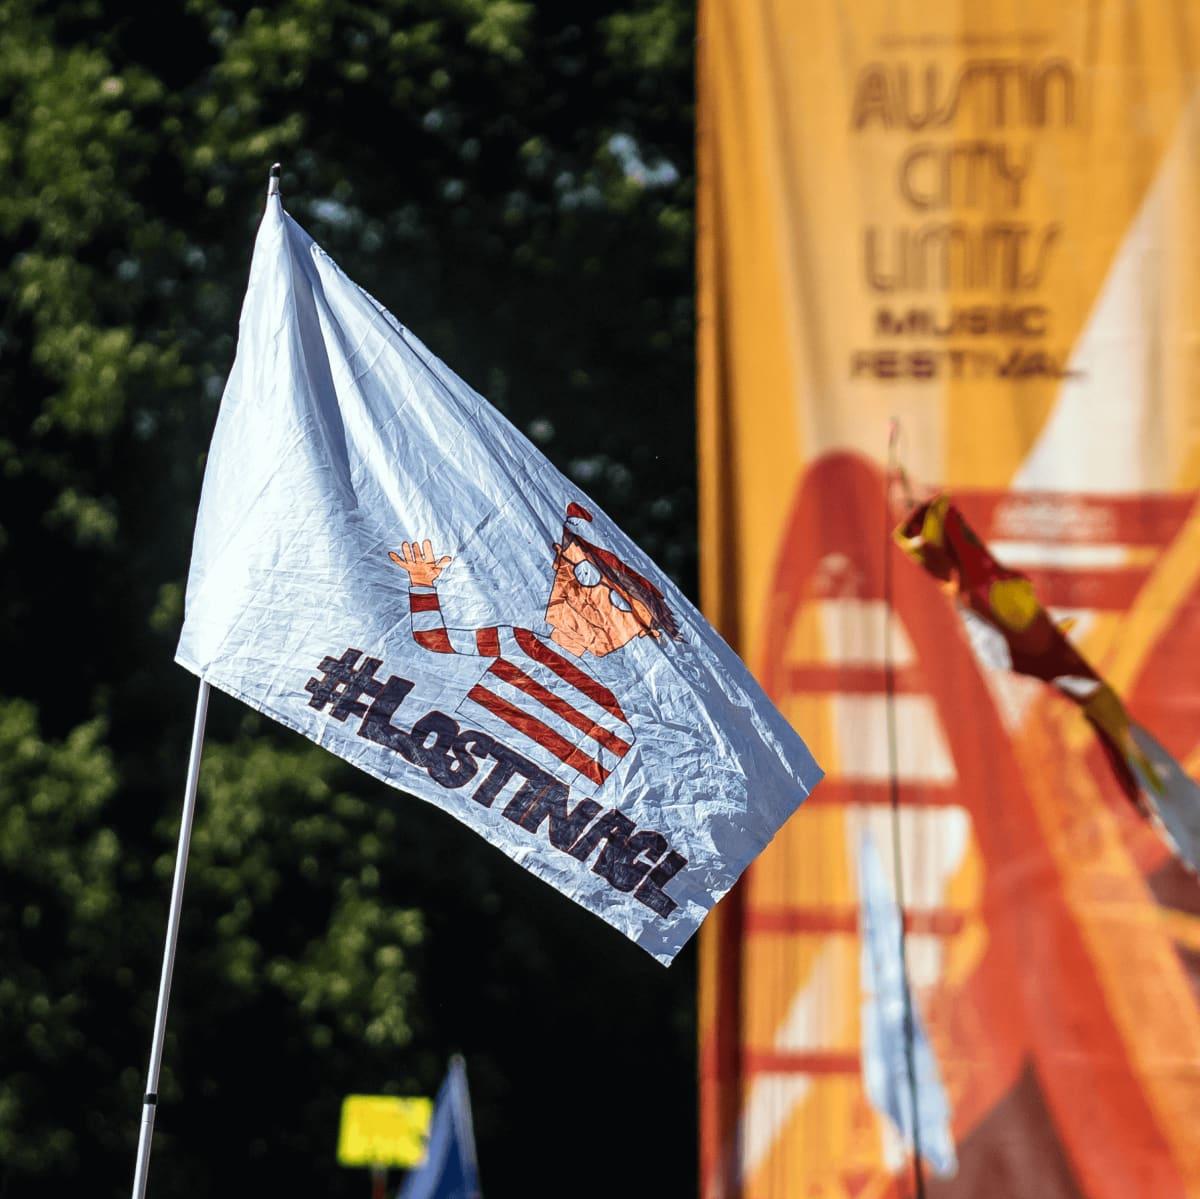 ACL Austin City Limits Music Festival 2016 flags Waldo